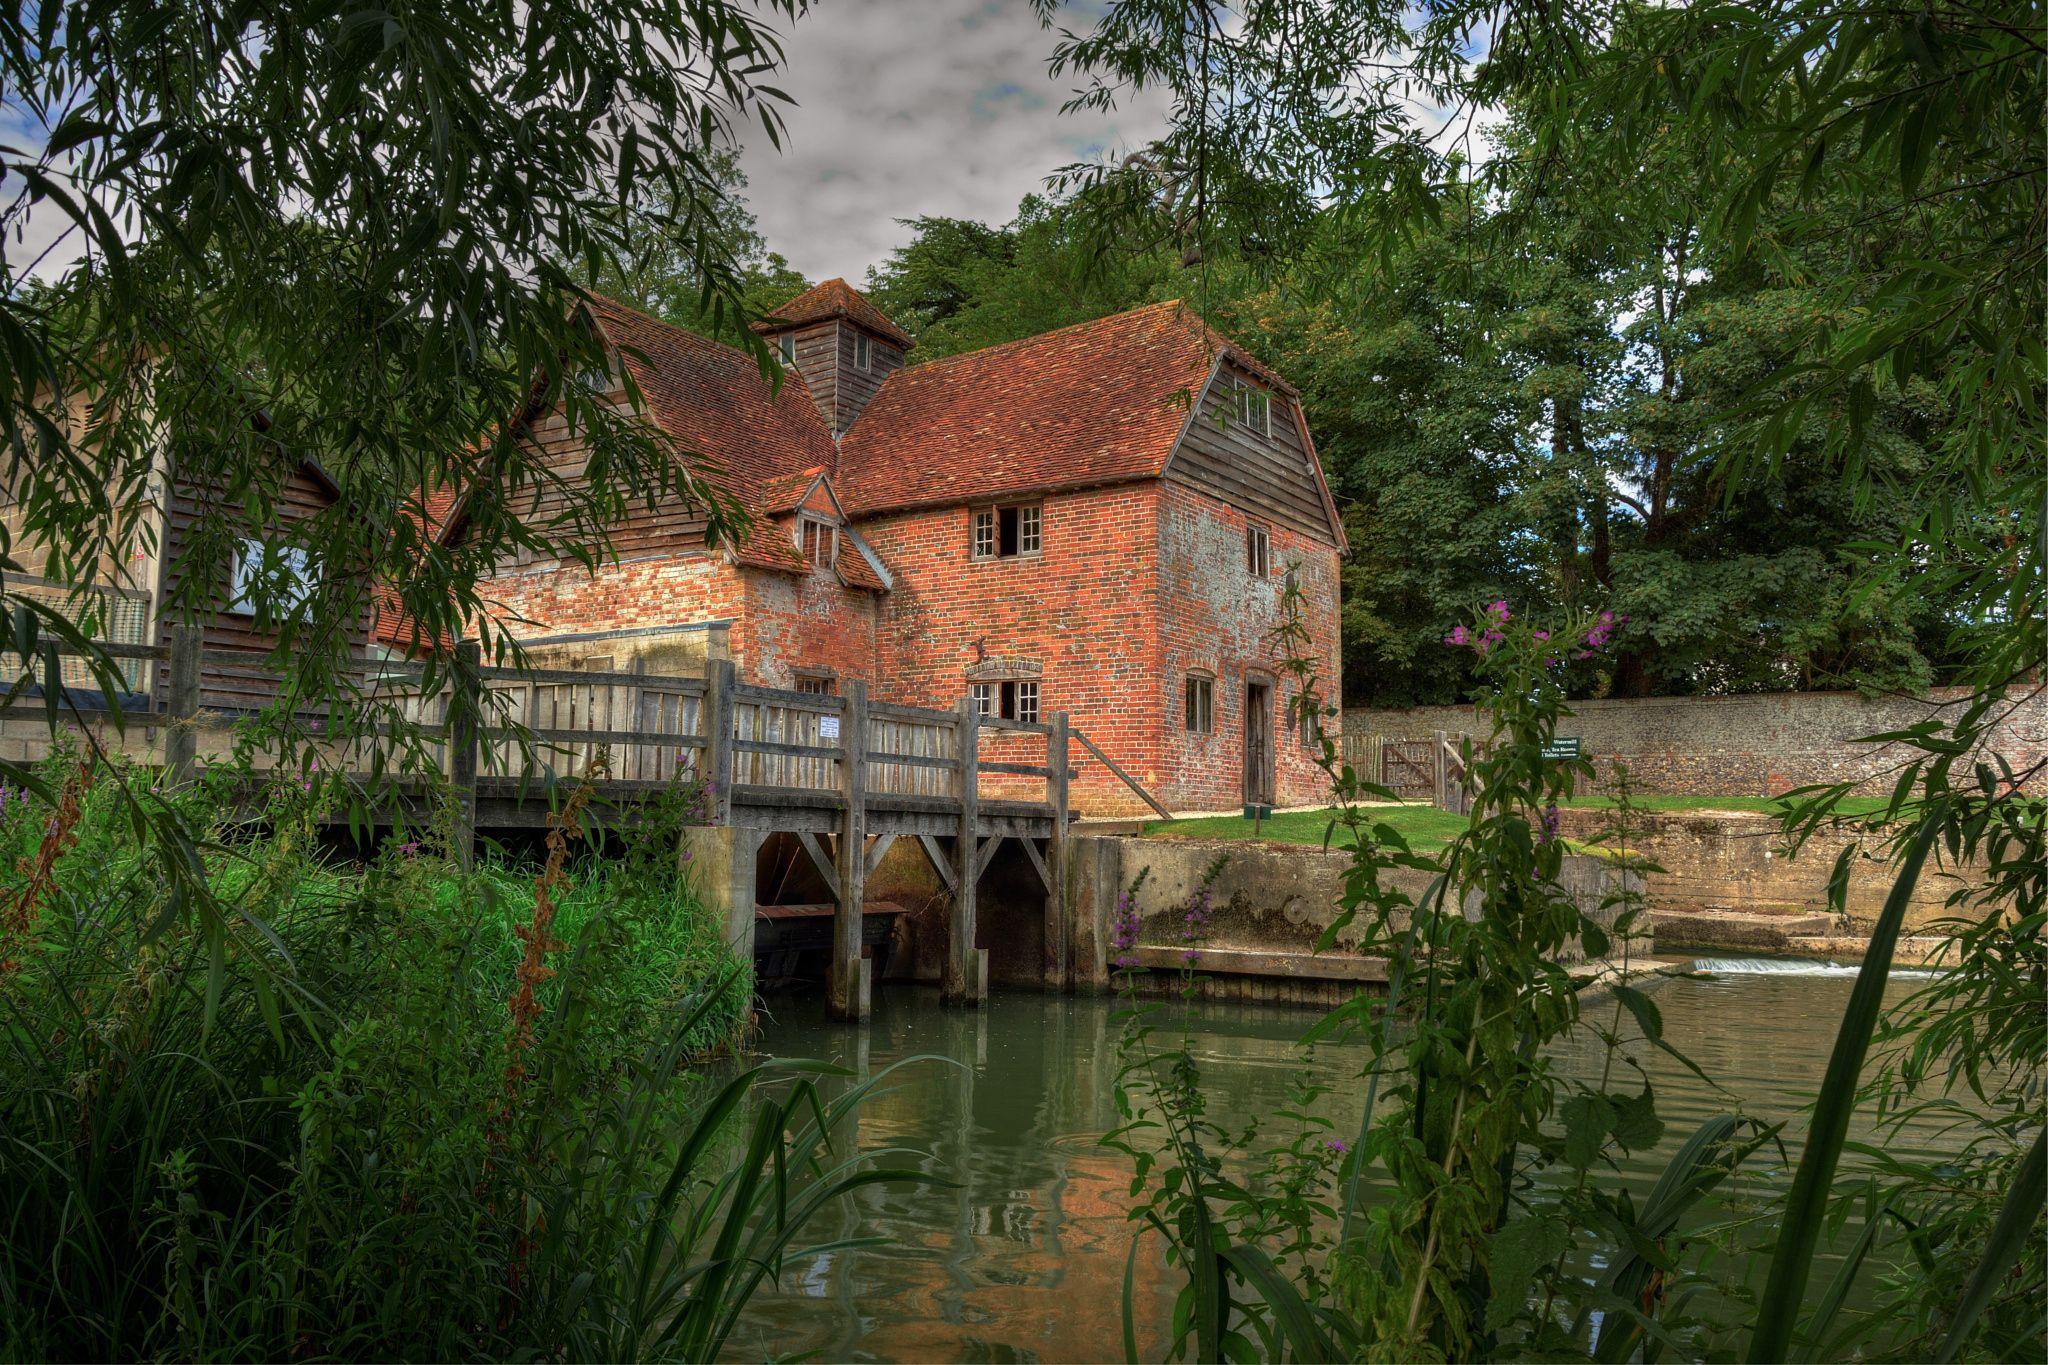 Mapledurham Watermill House Styles River Thames Thames